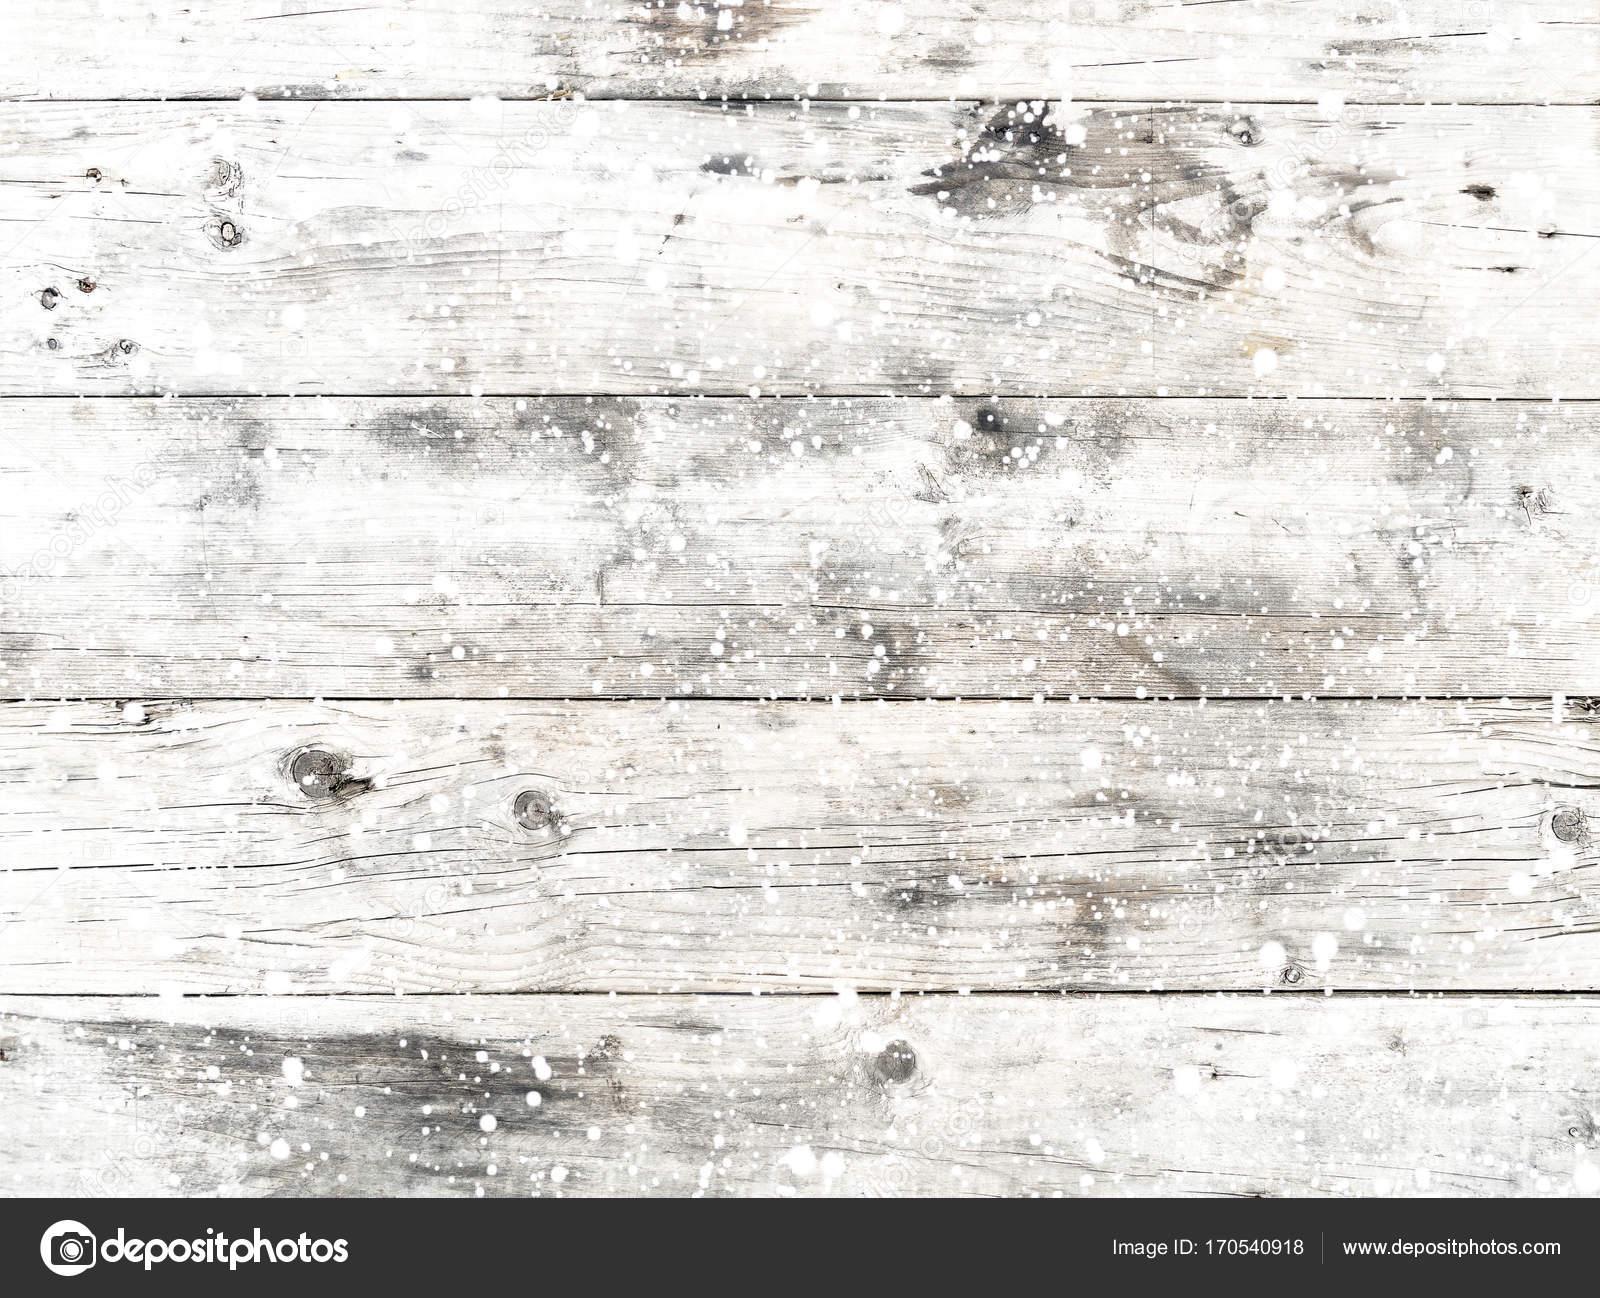 Old White Wood Texture With Snow Stock Photo C Jakkapan 170540918